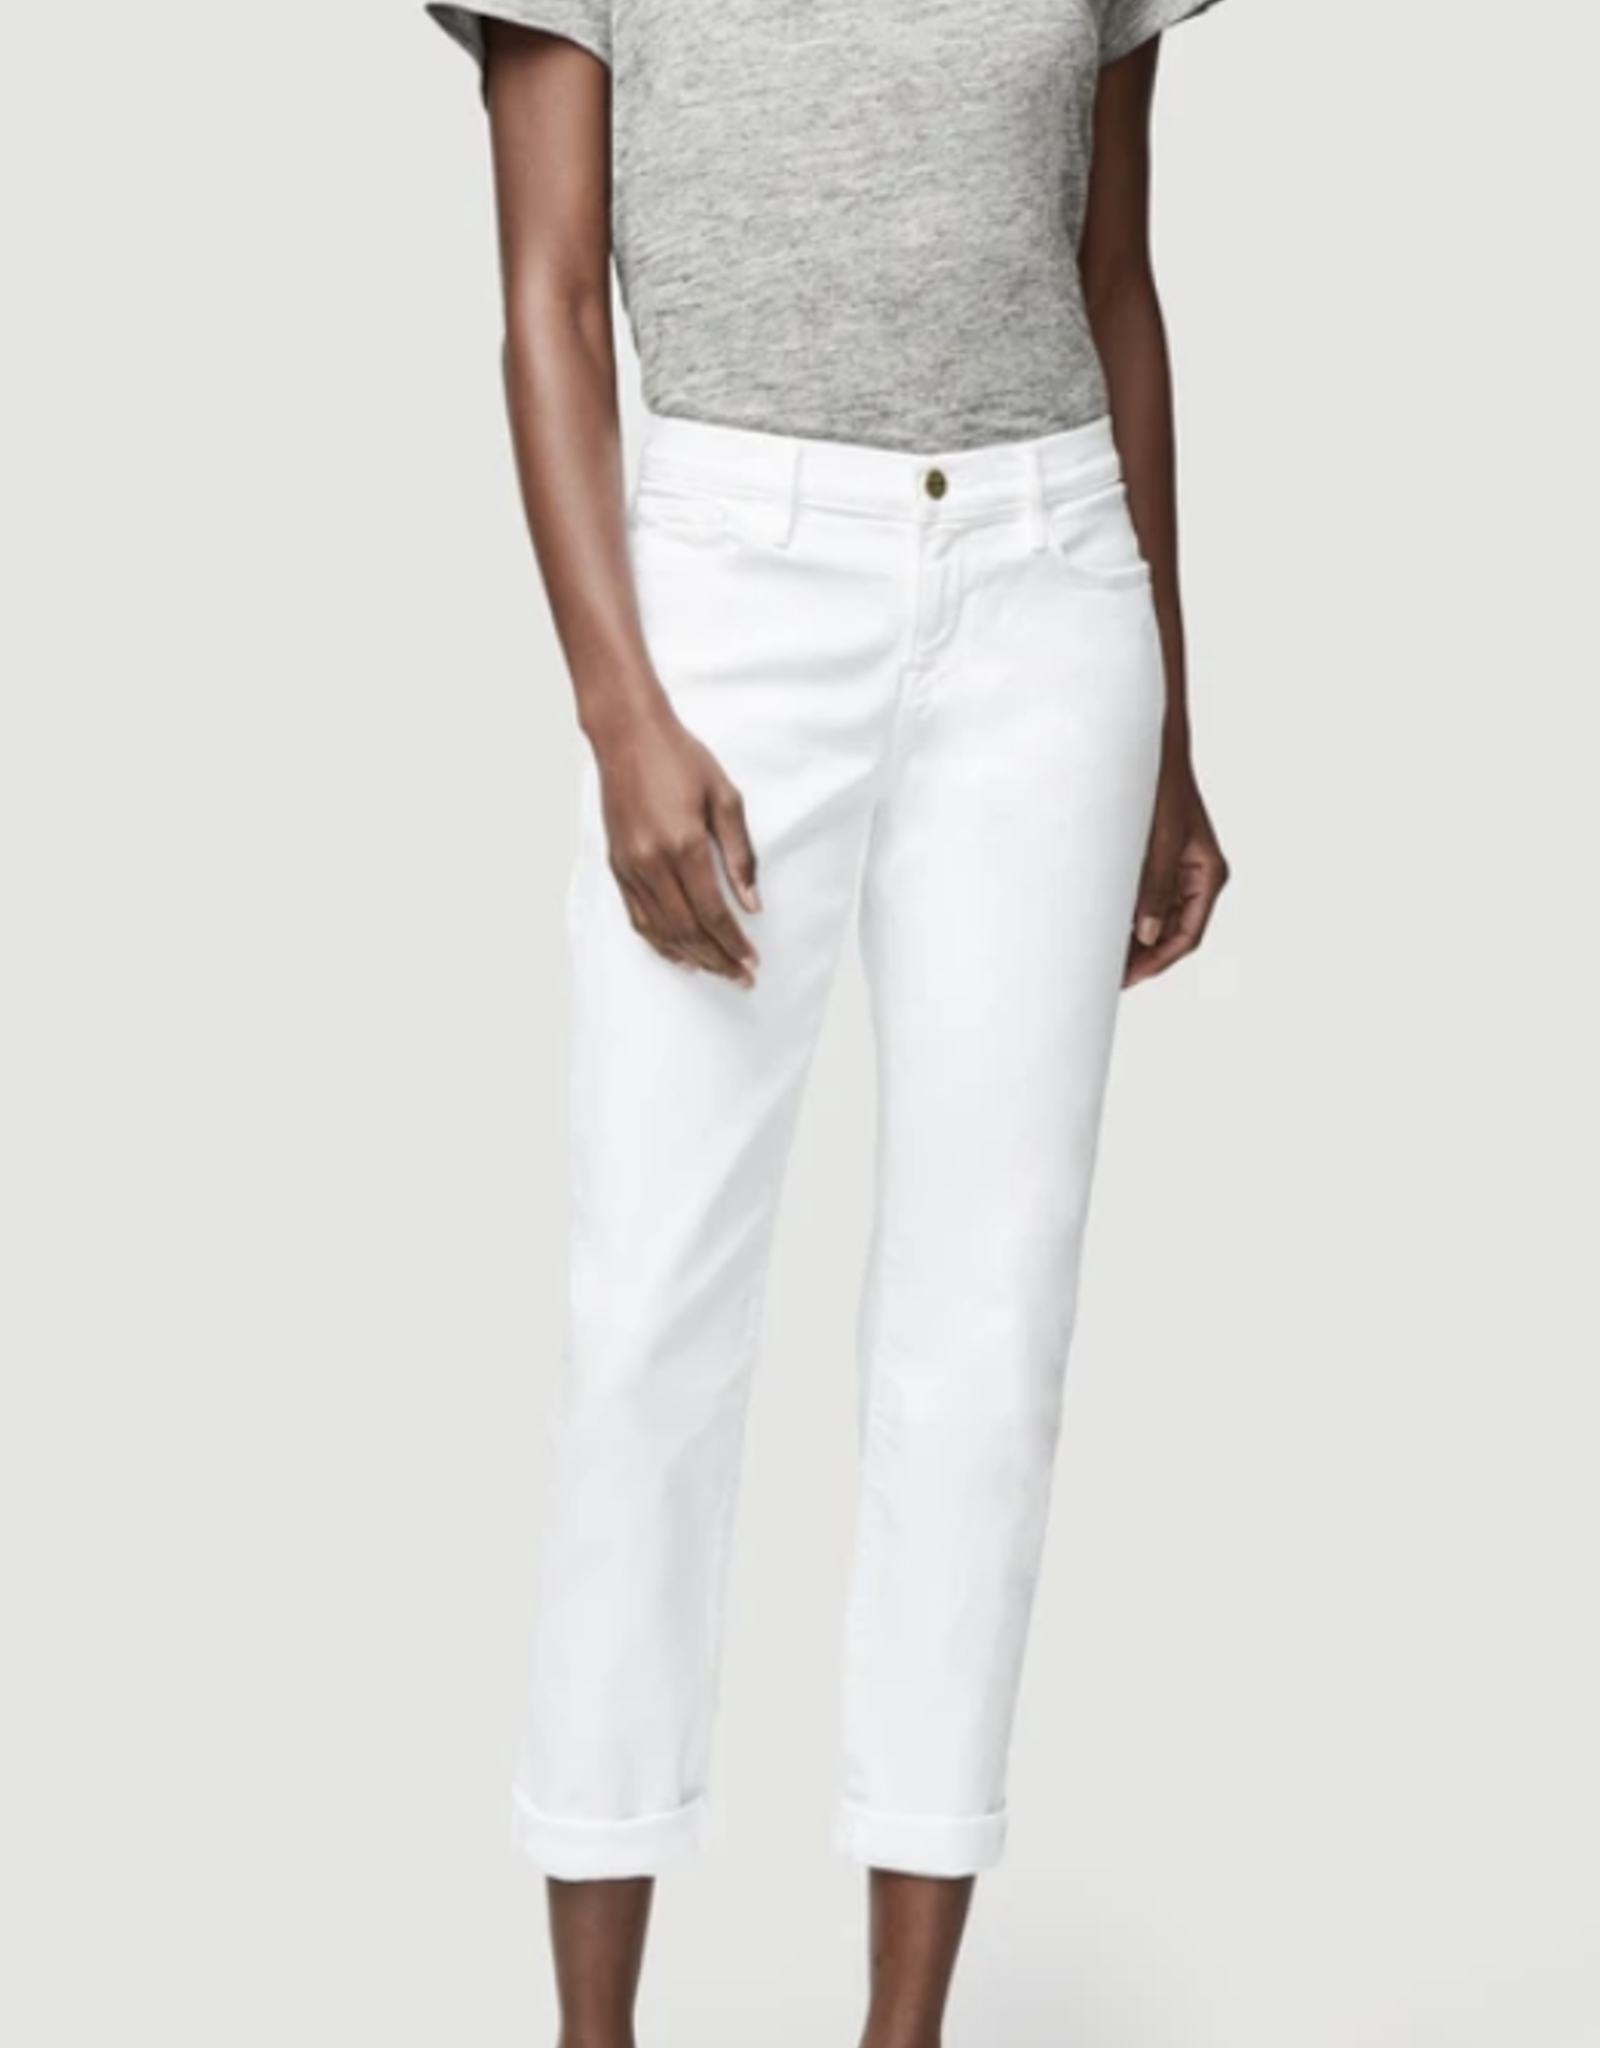 Frame Blanc Le Garcon Jeans